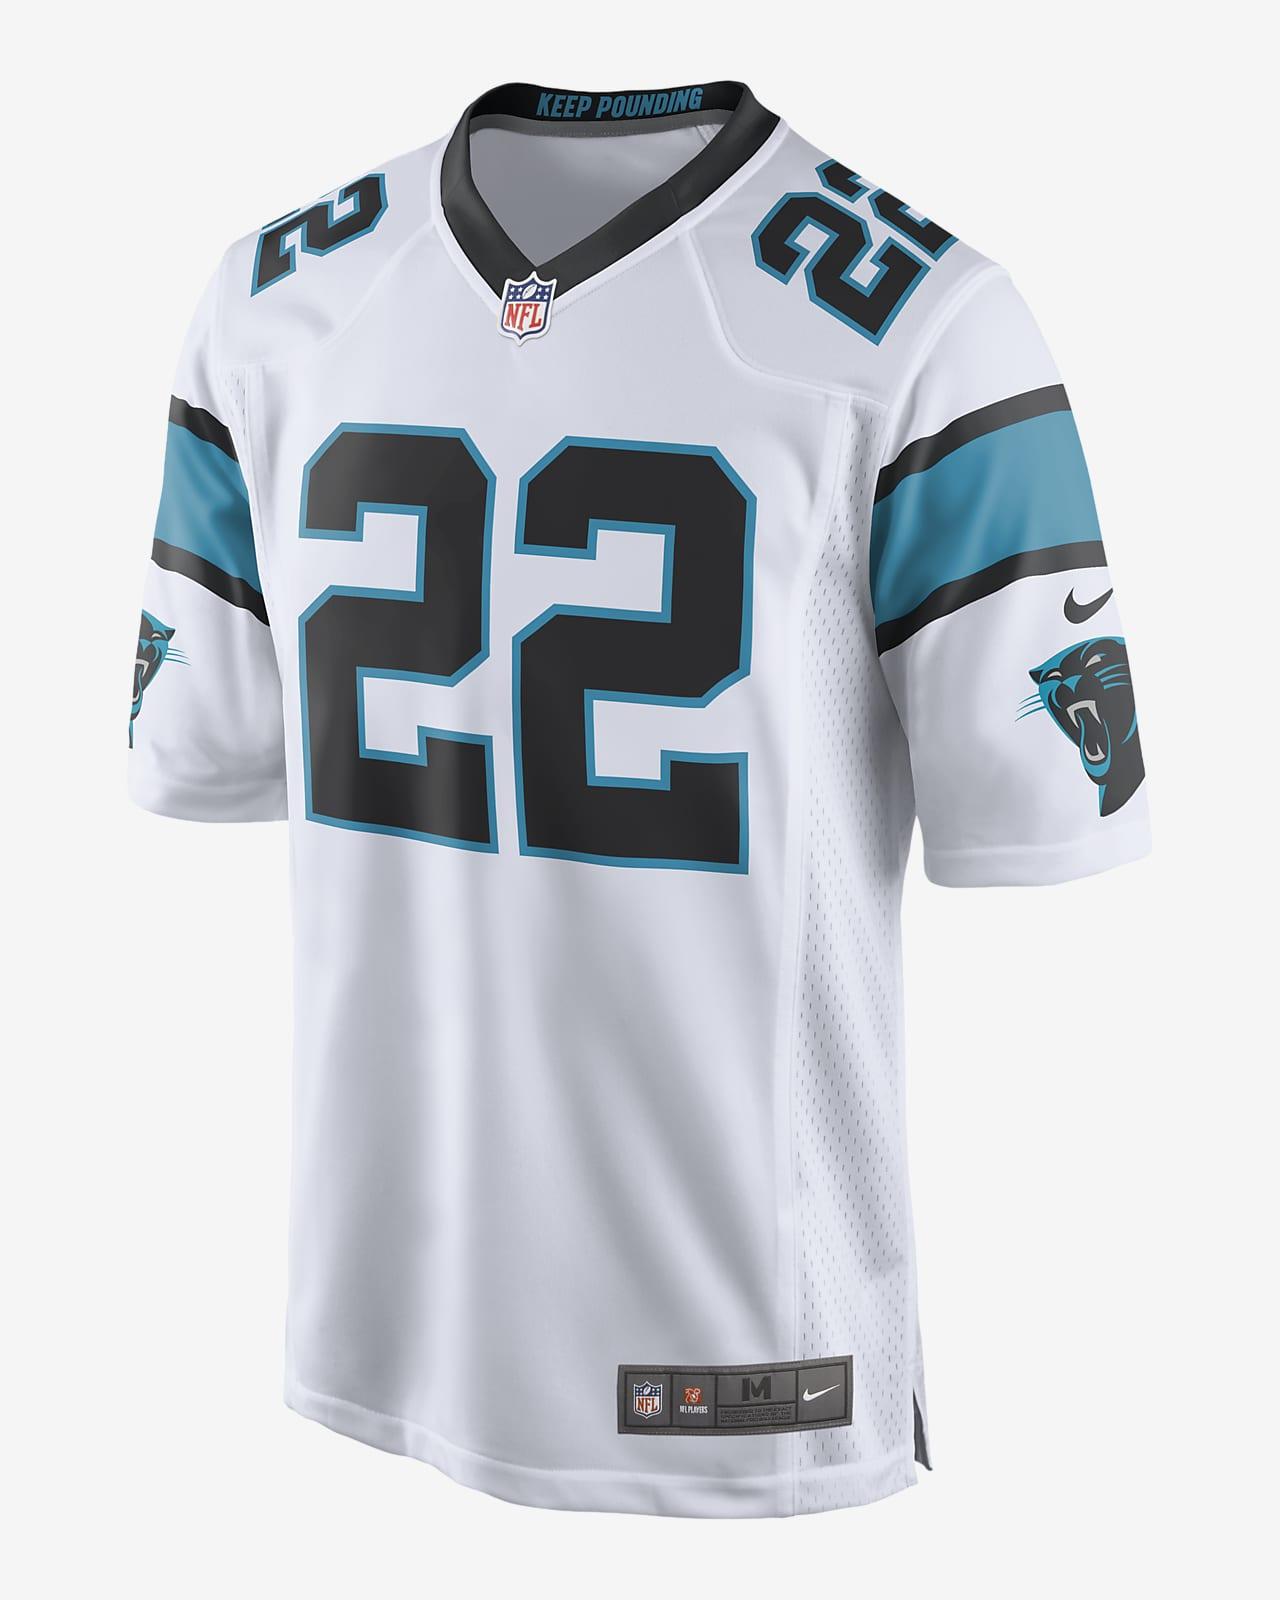 NFL Carolina Panthers (Christian McCaffrey) Men's Game Football Jersey